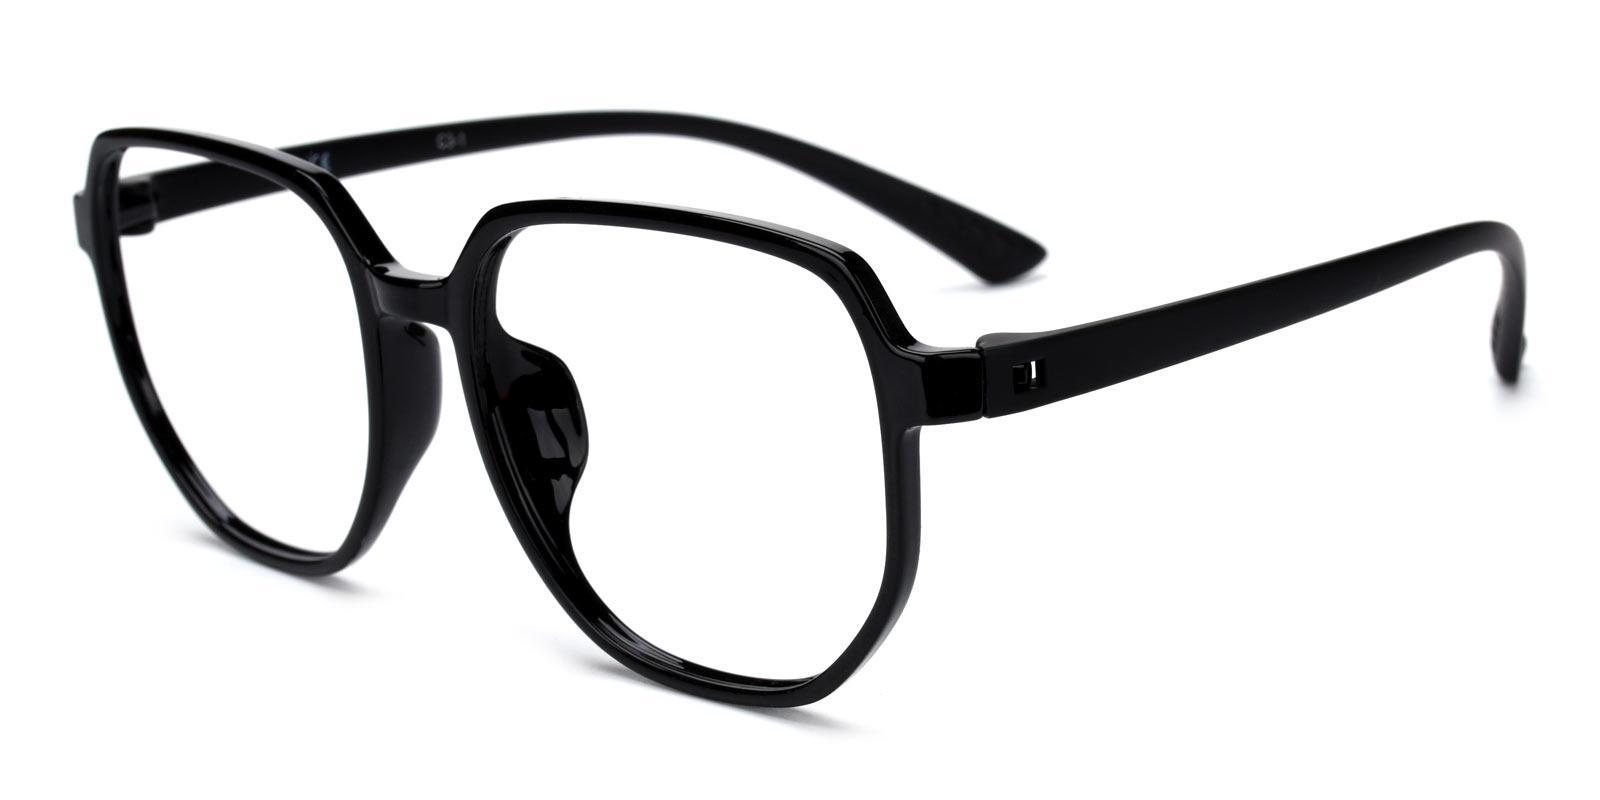 Pie-Black-Square-TR-Eyeglasses-additional1